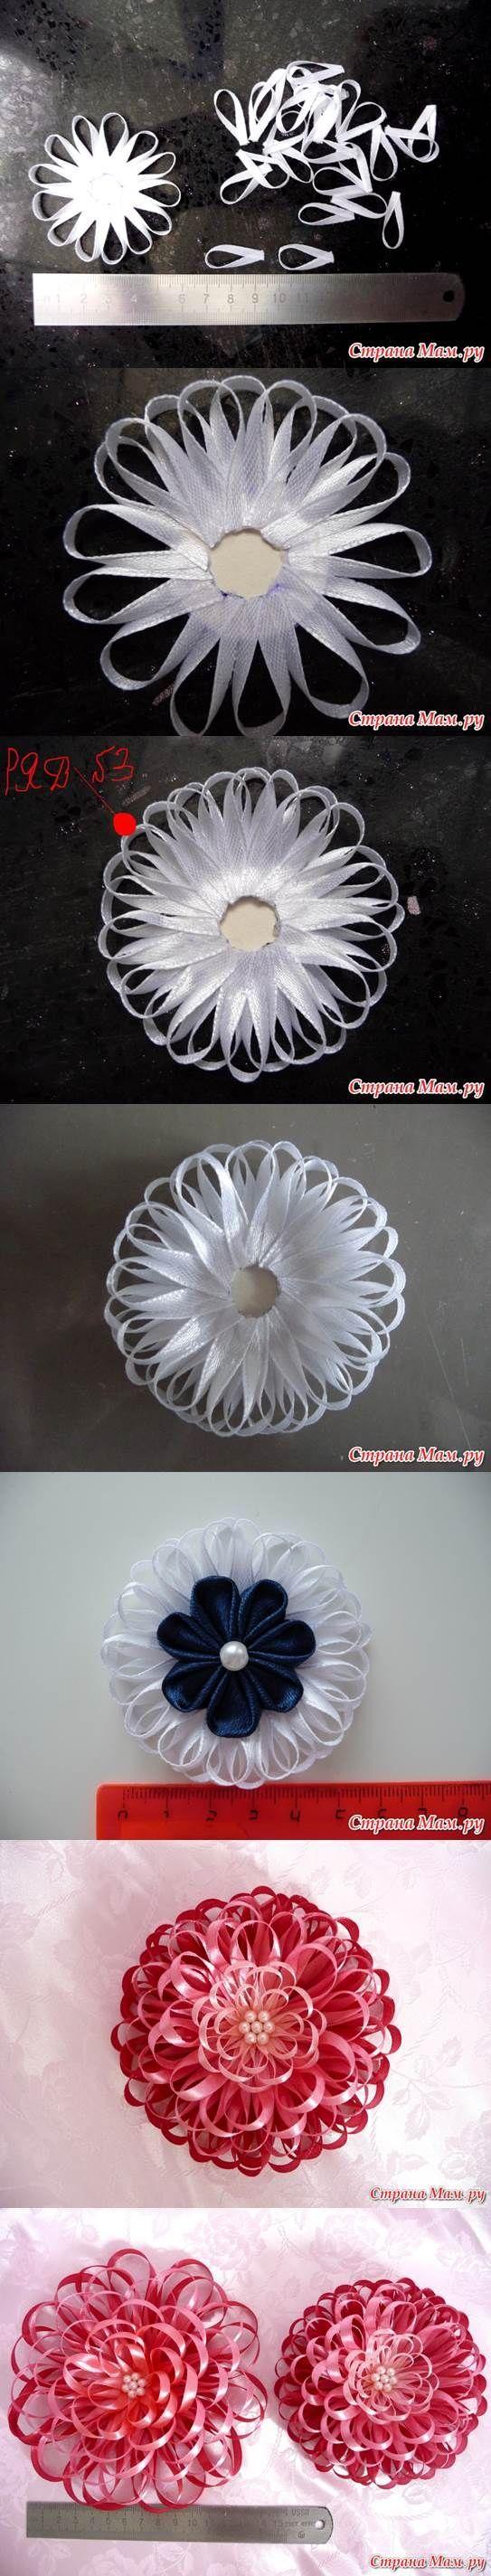 DIY Narrow Satin Ribbon Flower   iCreativeIdeas.com Like Us on Facebook ==> https://www.facebook.com/icreativeideas: